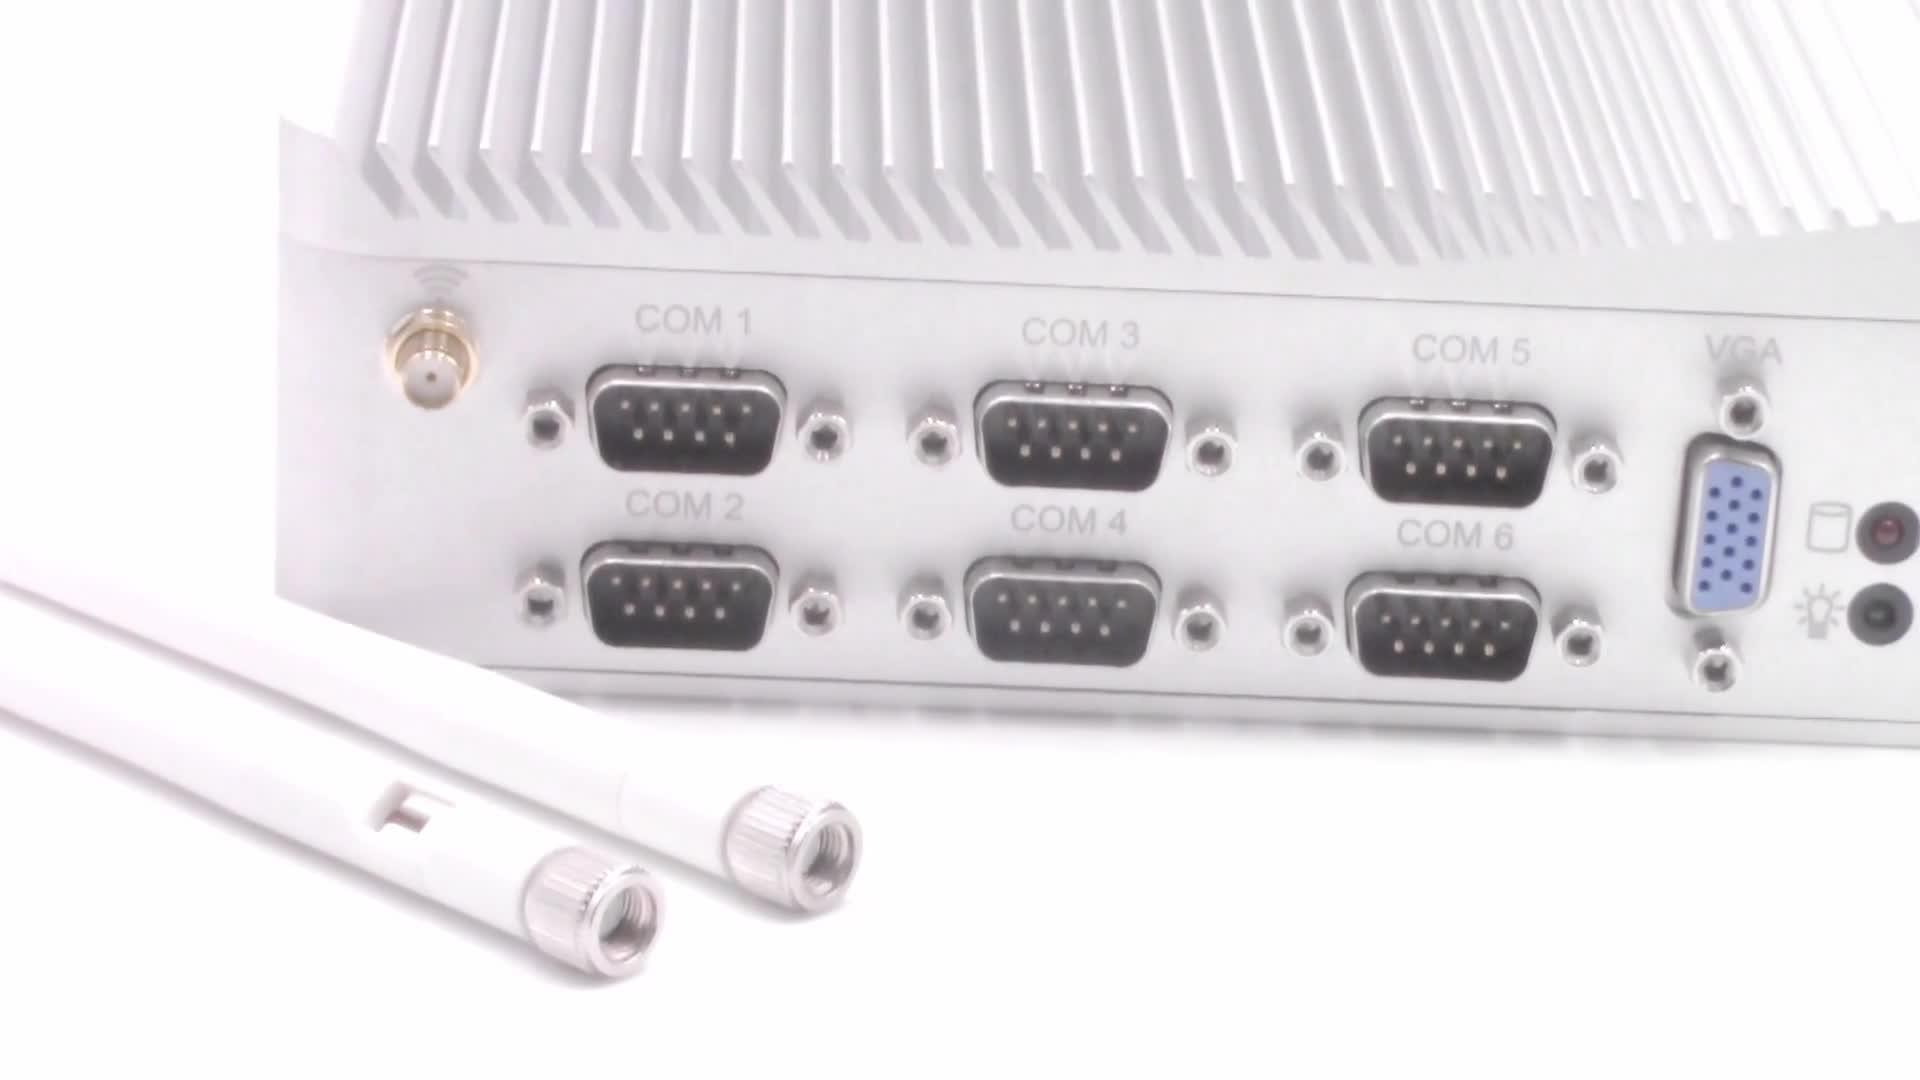 j1900 mini fanless pc with linux ubuntu rs232 rs485 dual lan barebone industrial pc